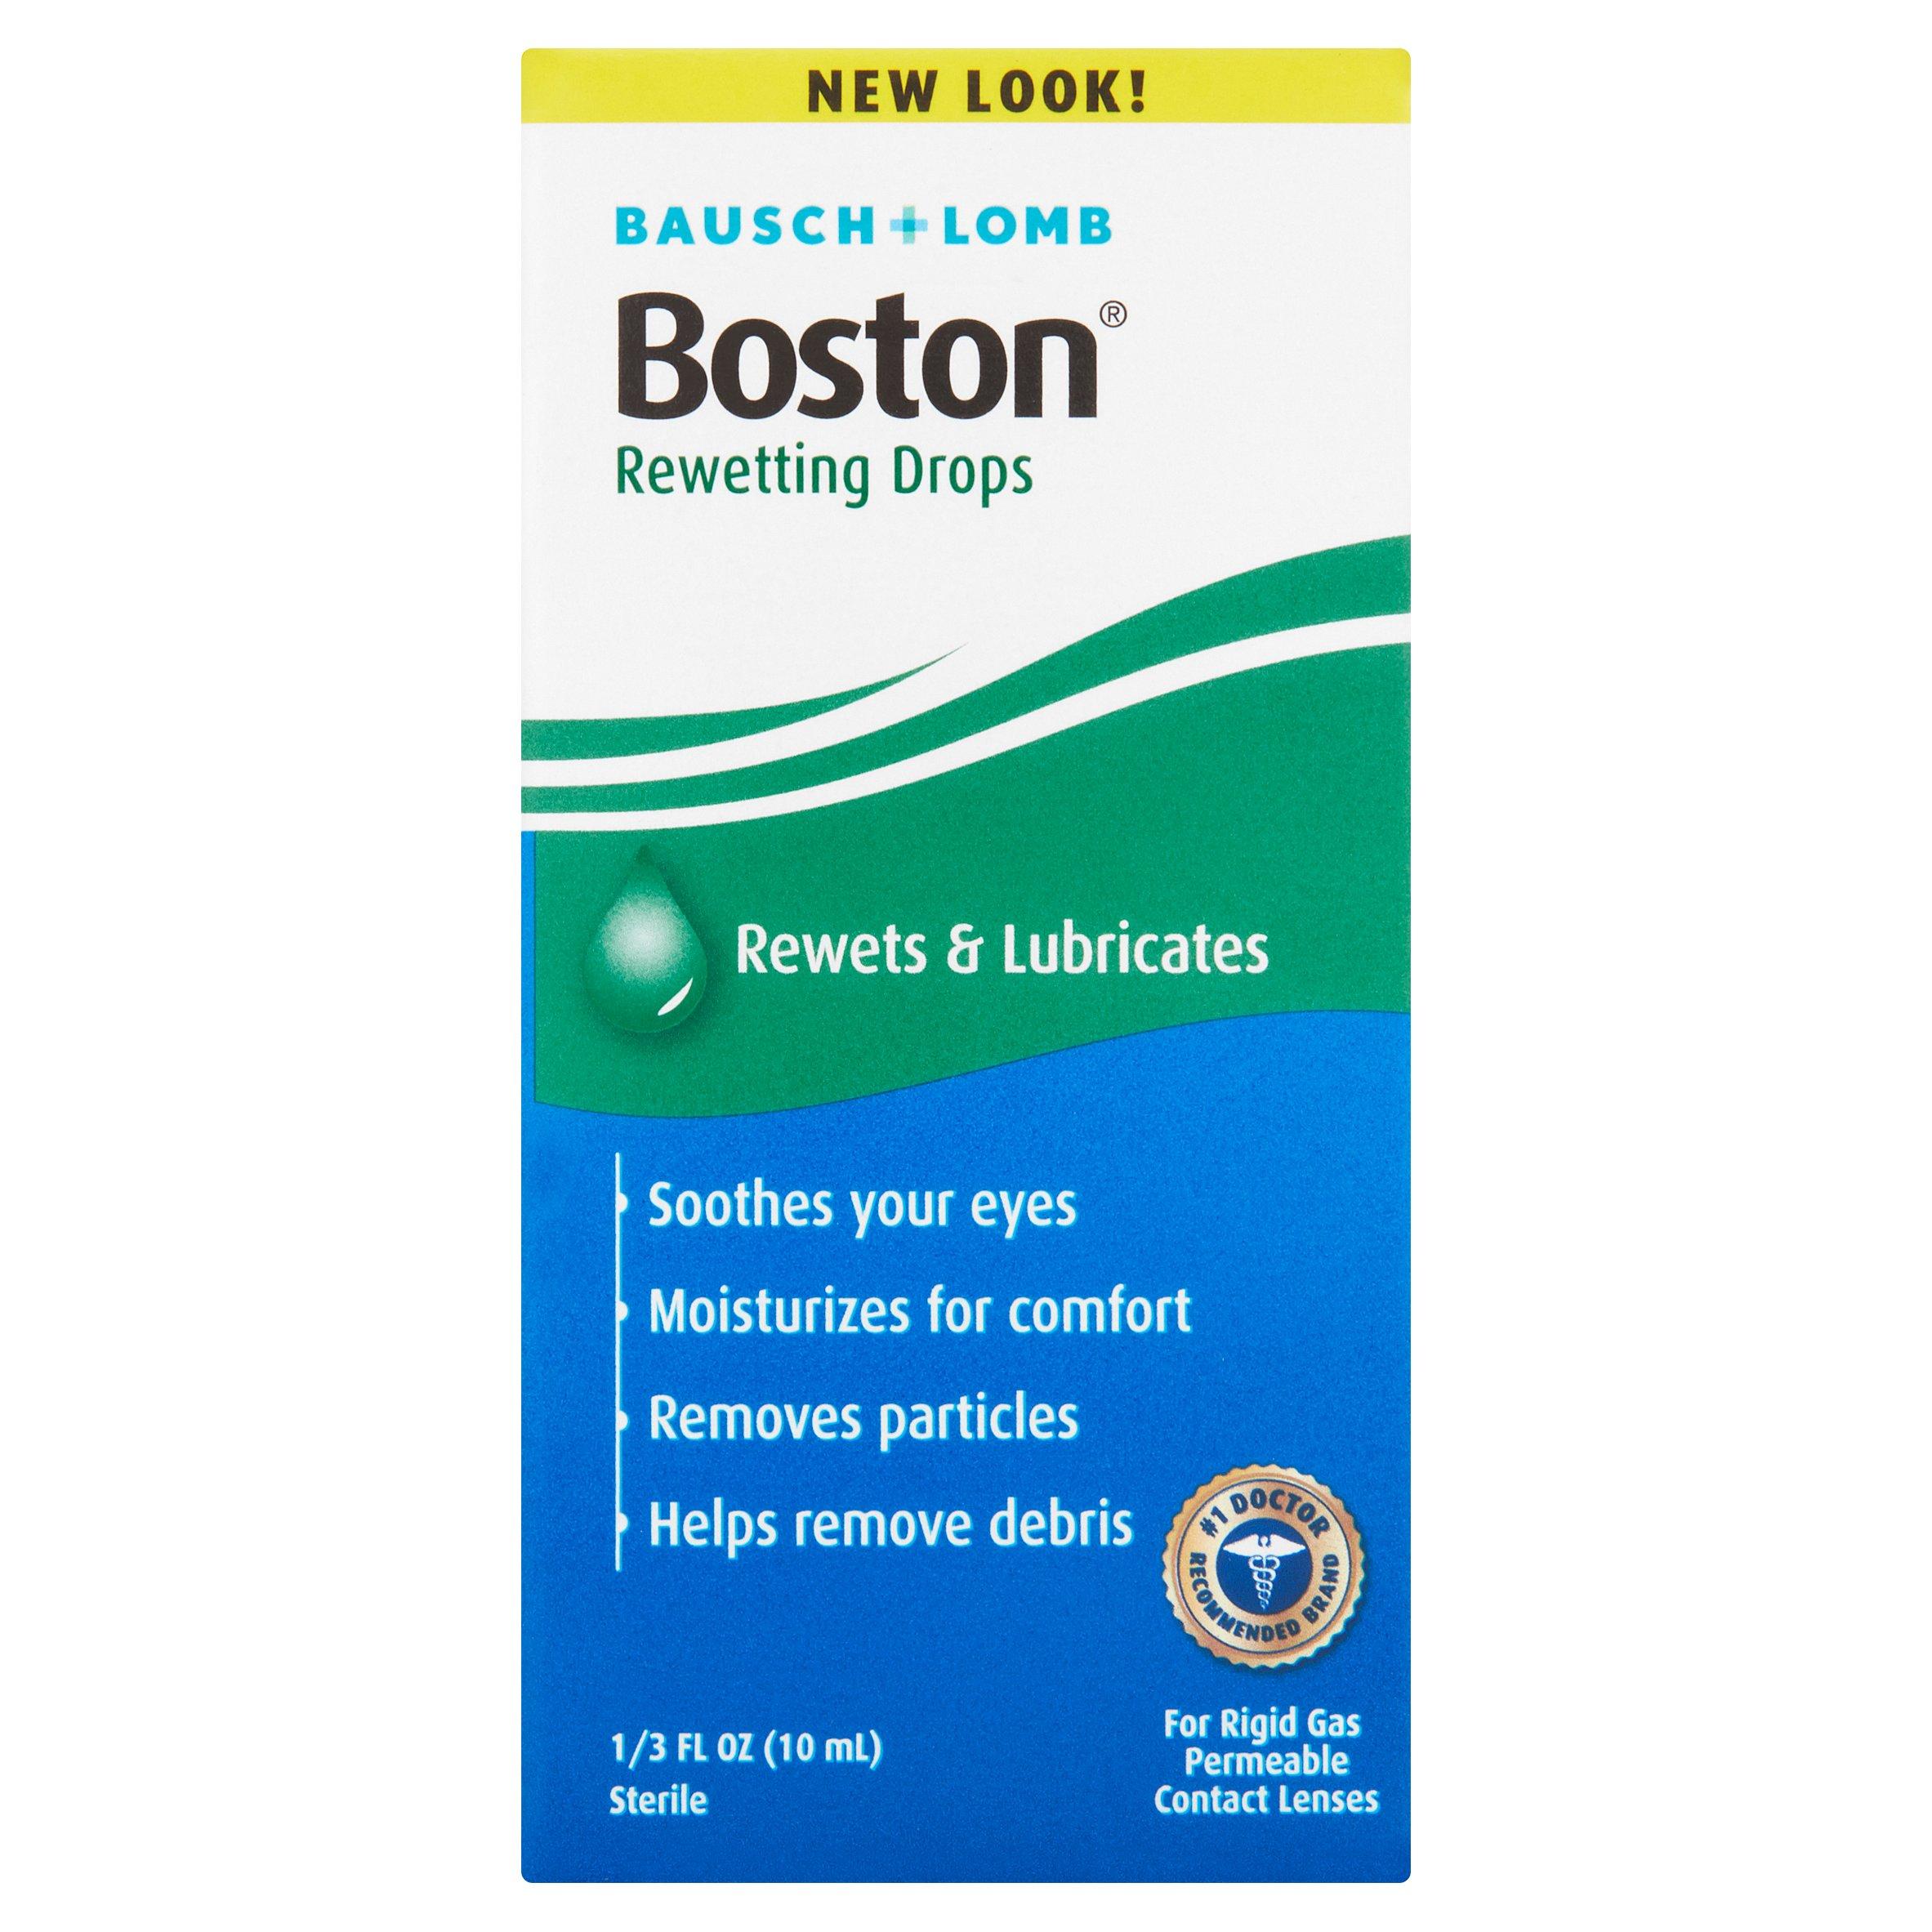 Bausch + Lomb Boston Rewets & Lubricates Rewetting Drops, 1/3 fl oz